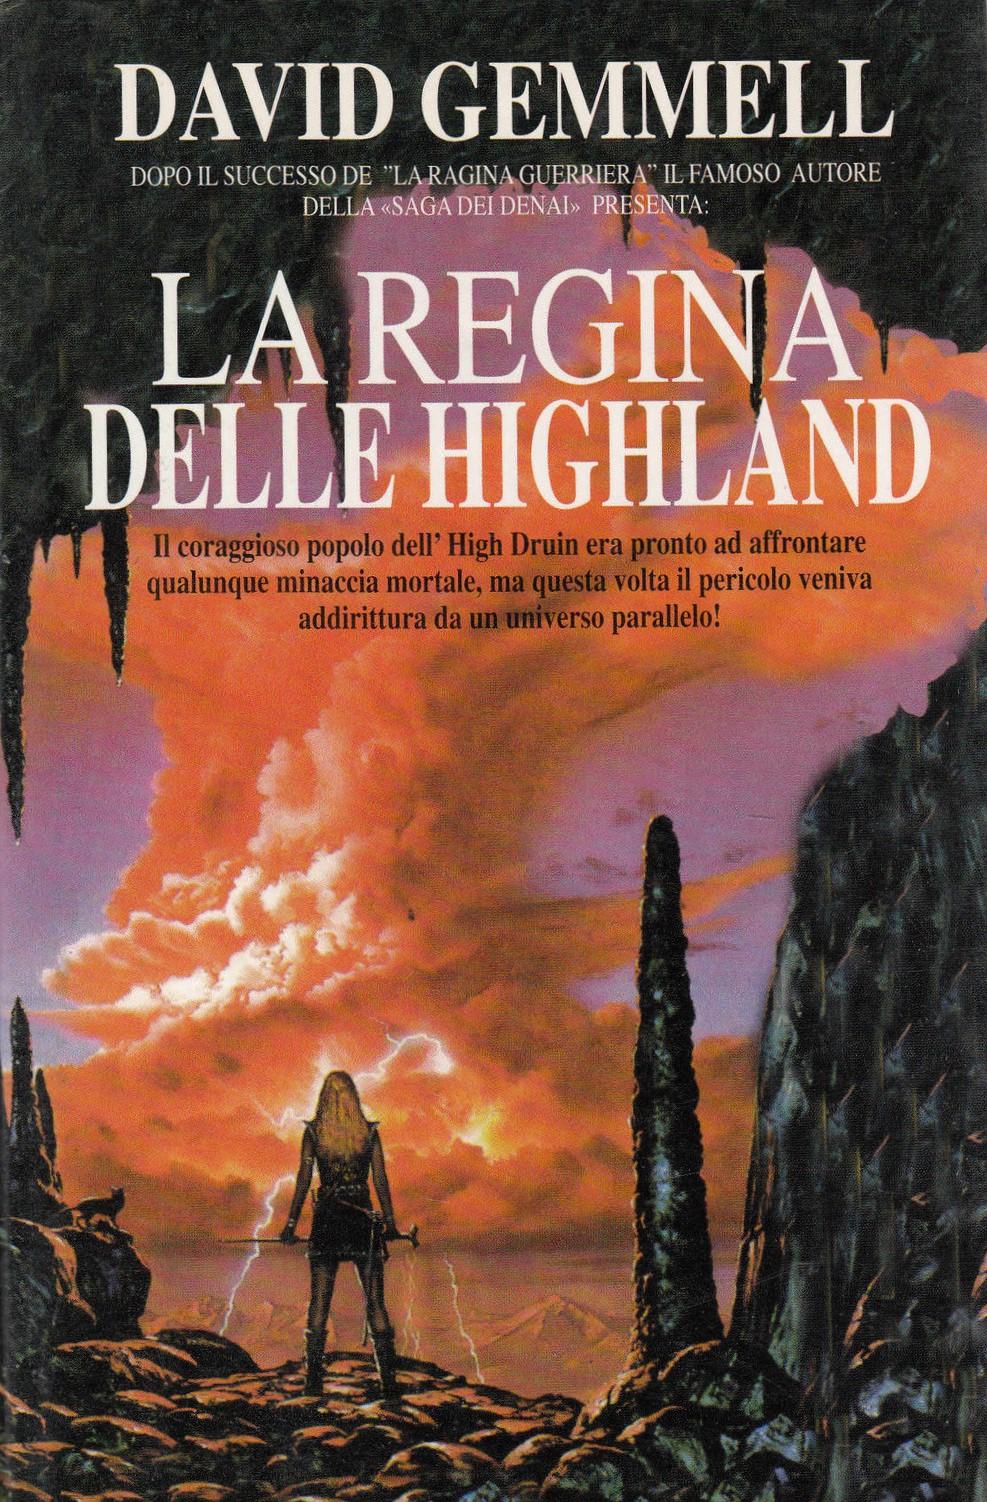 La regina delle Highland